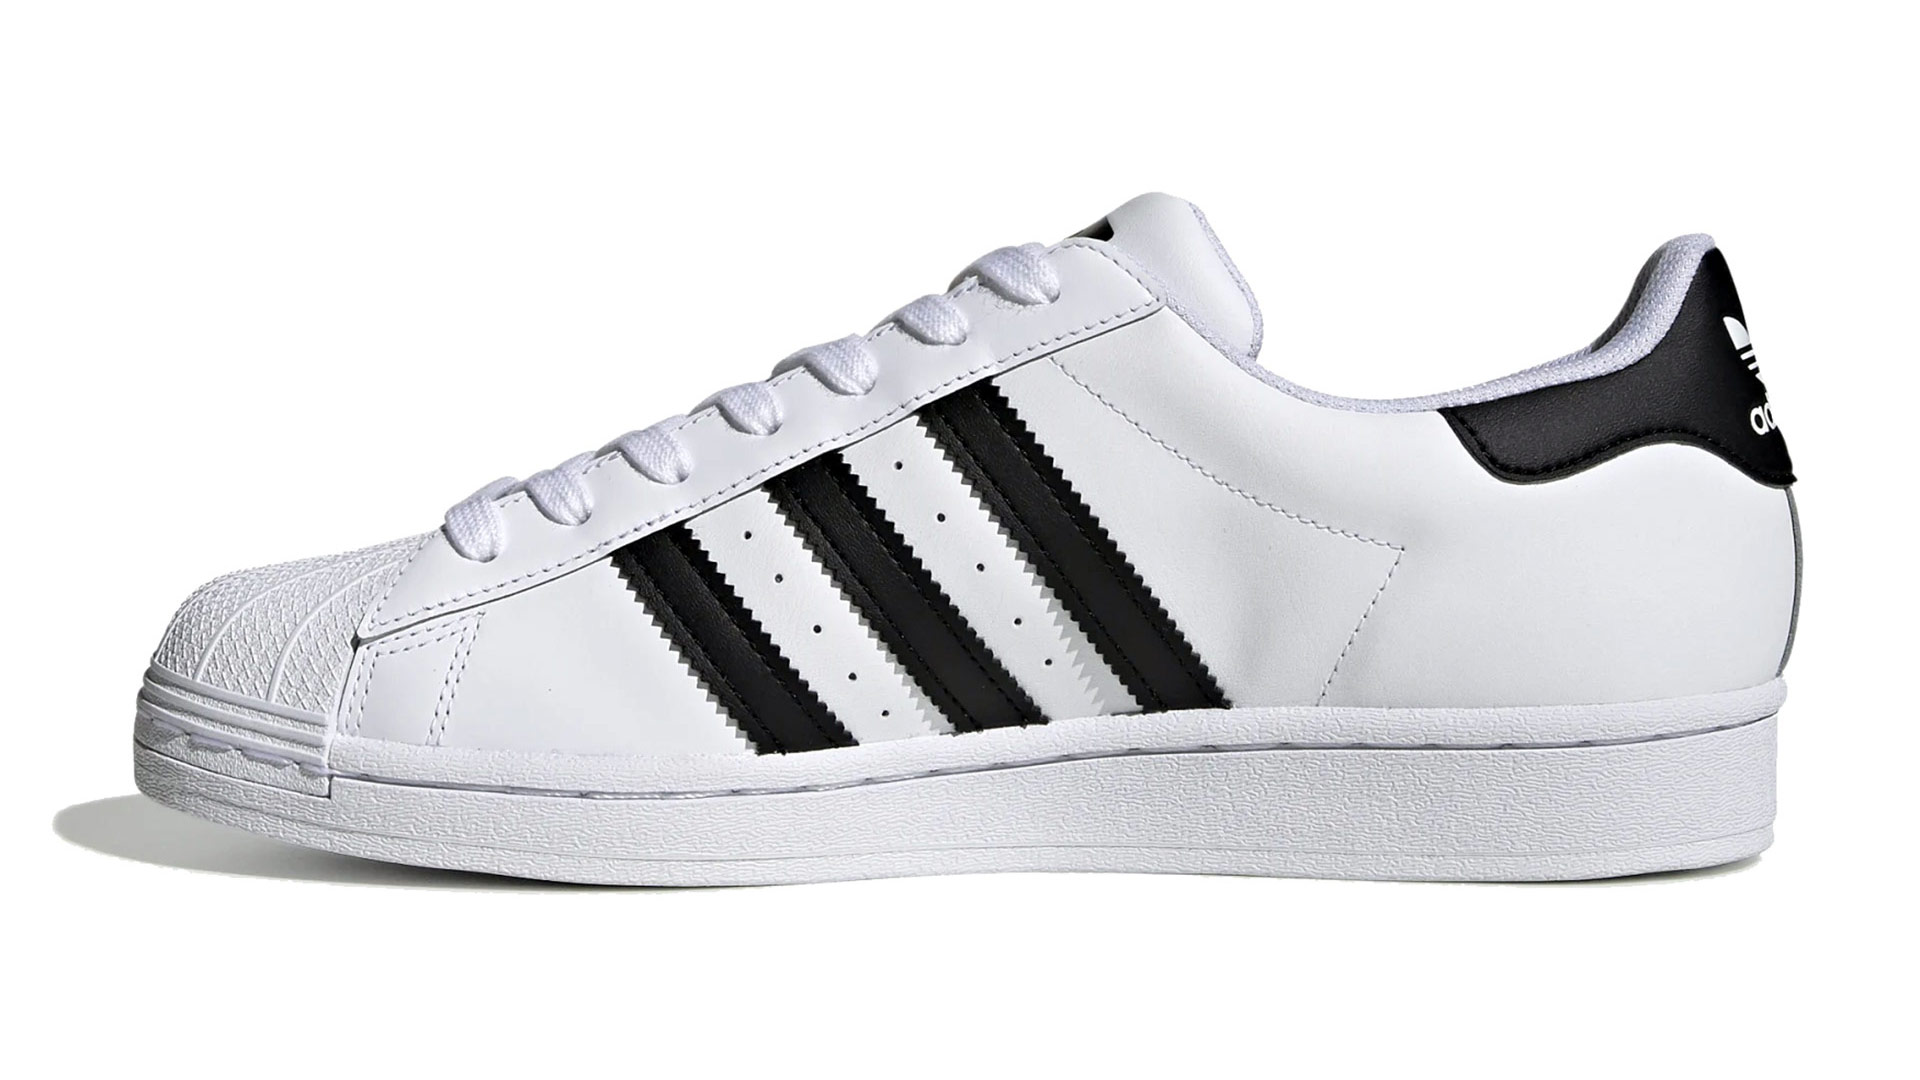 Adidas Superstar z roku 2020. © Adidas